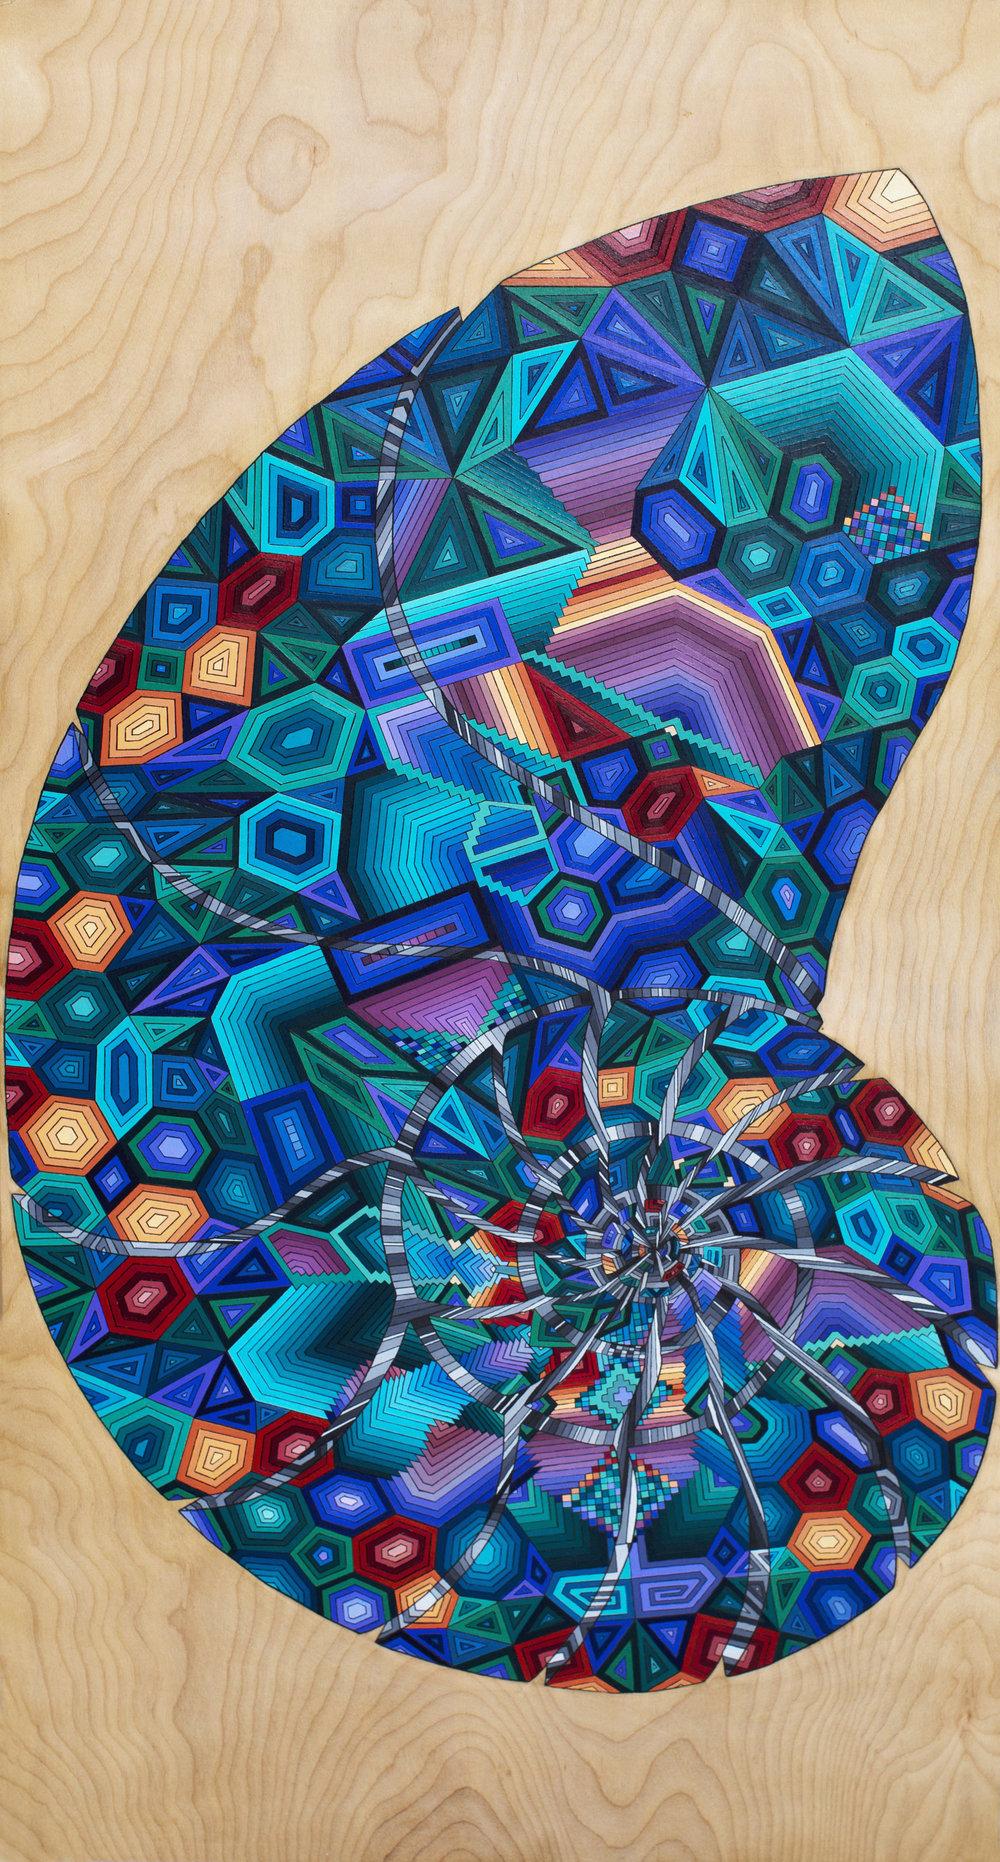 Cosmic Rebirth (2016)